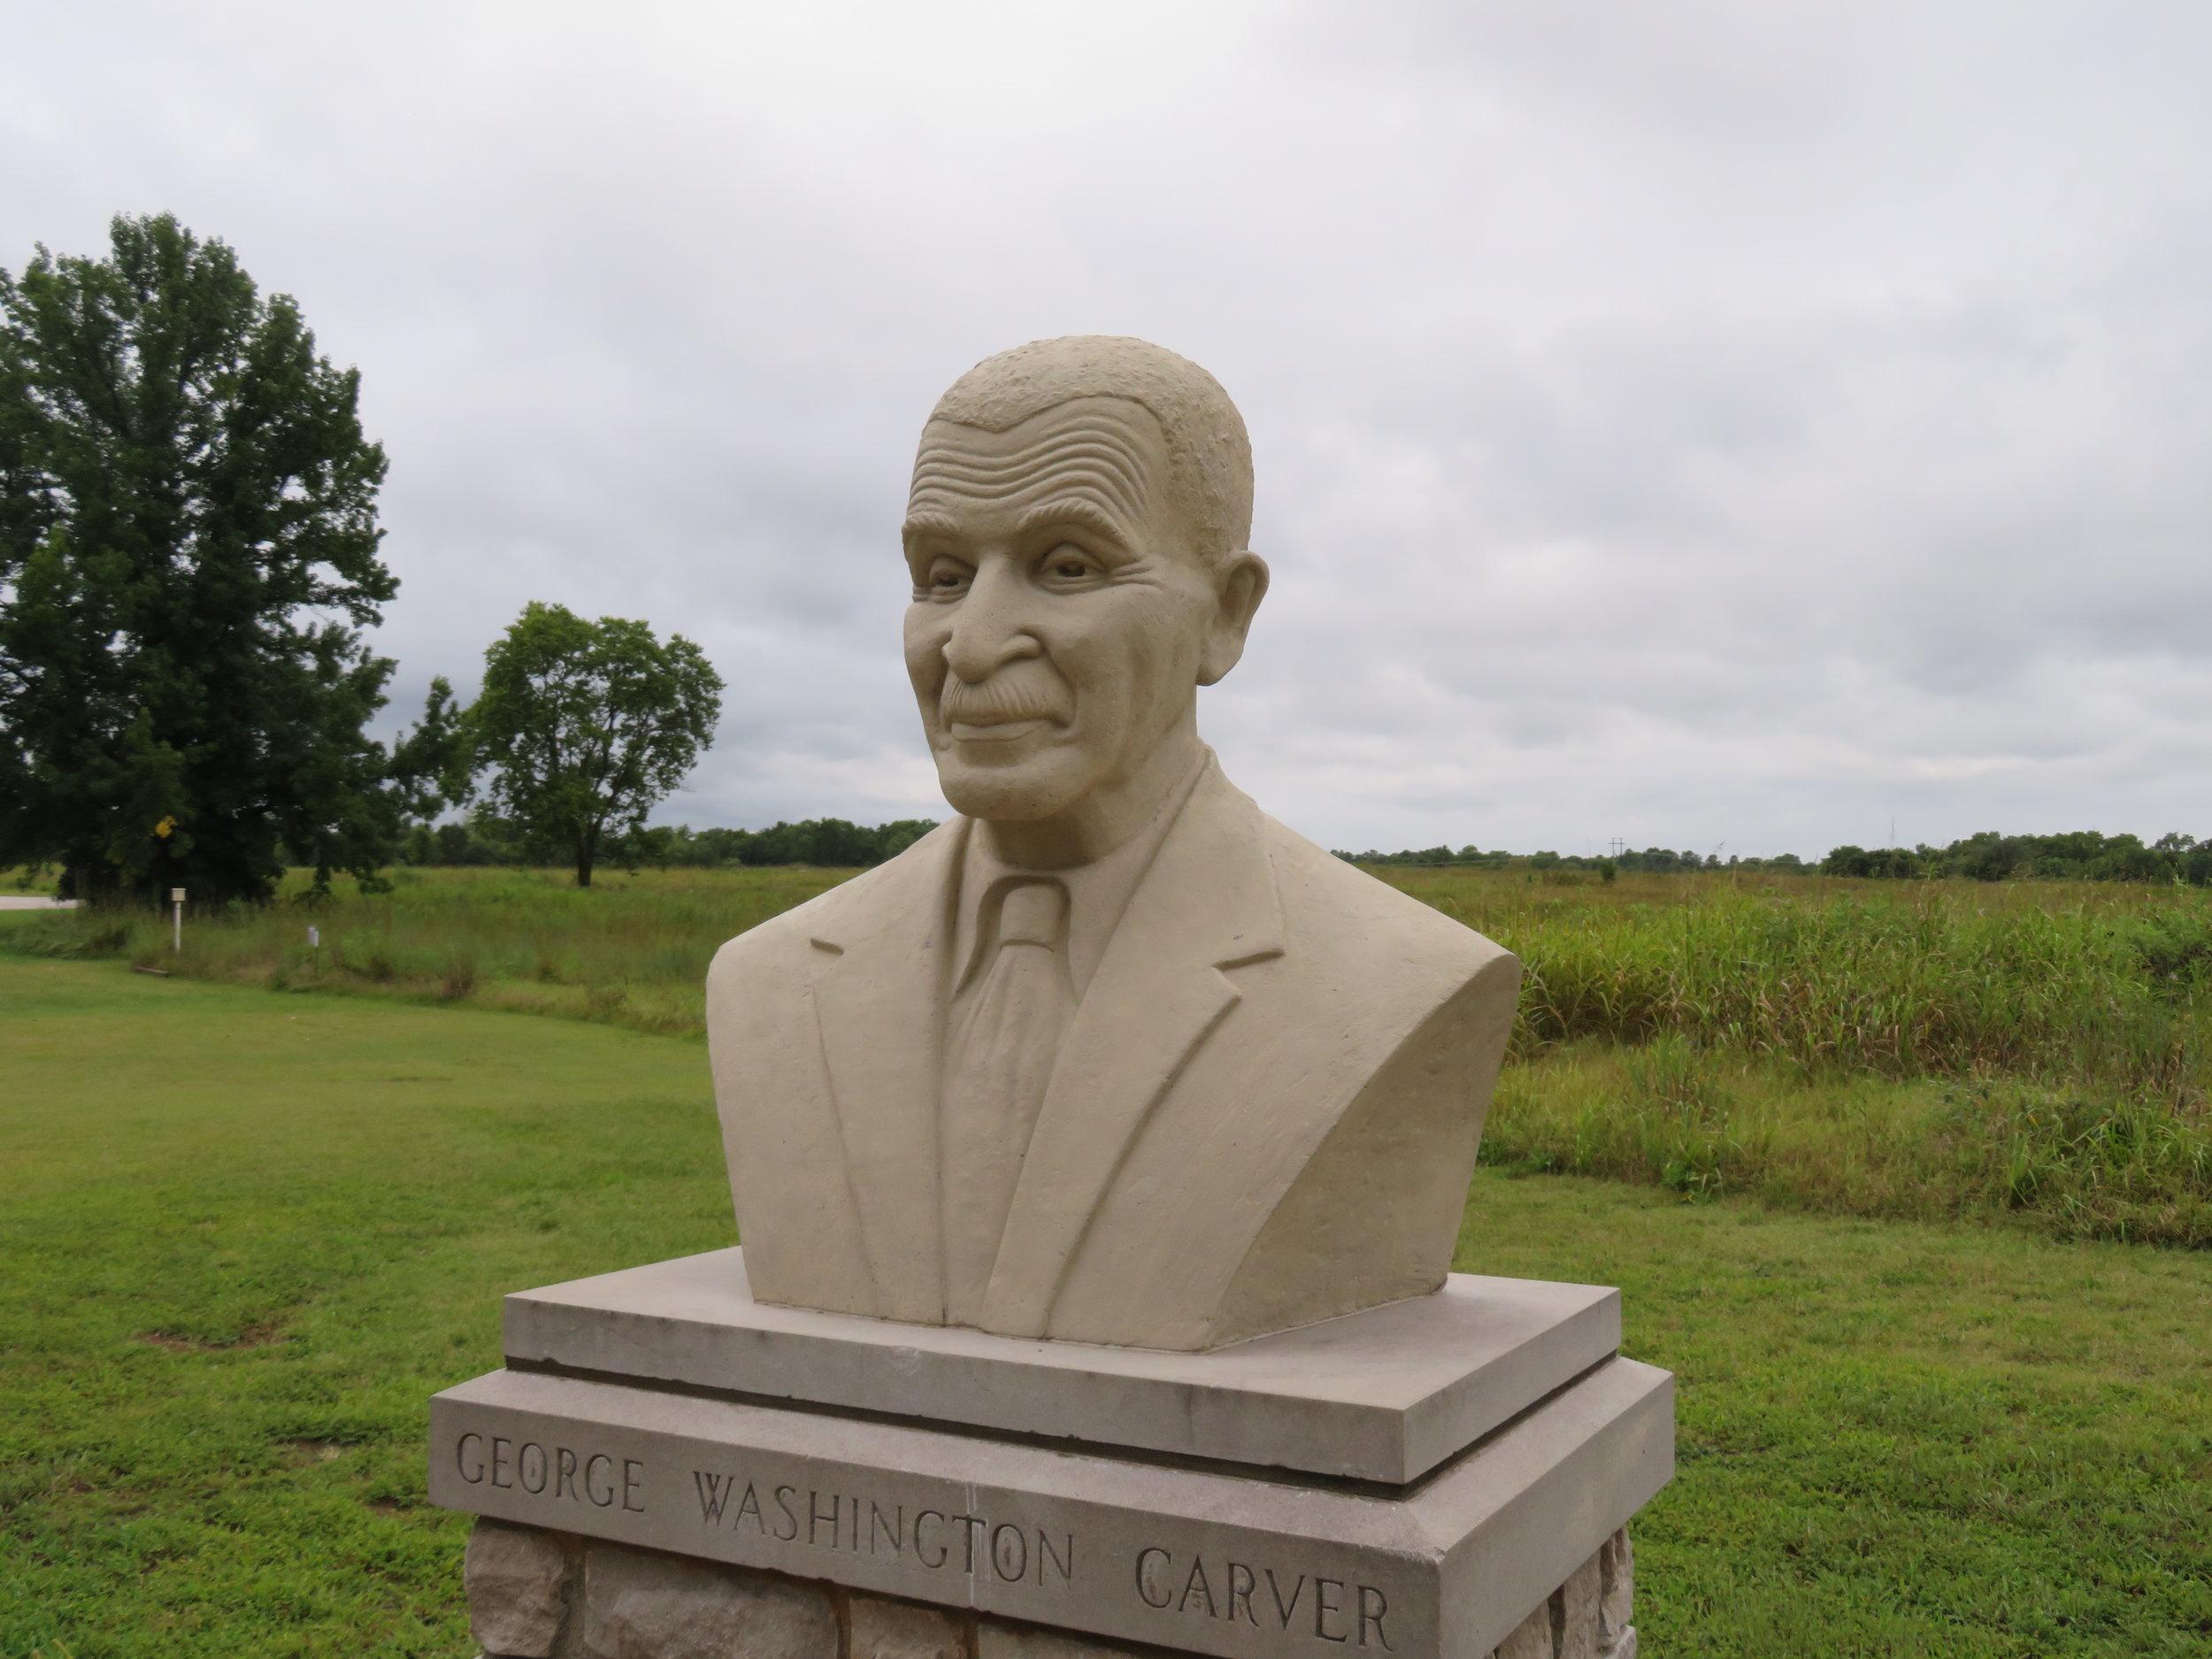 George Washington Carver NM  - MO - August 2018